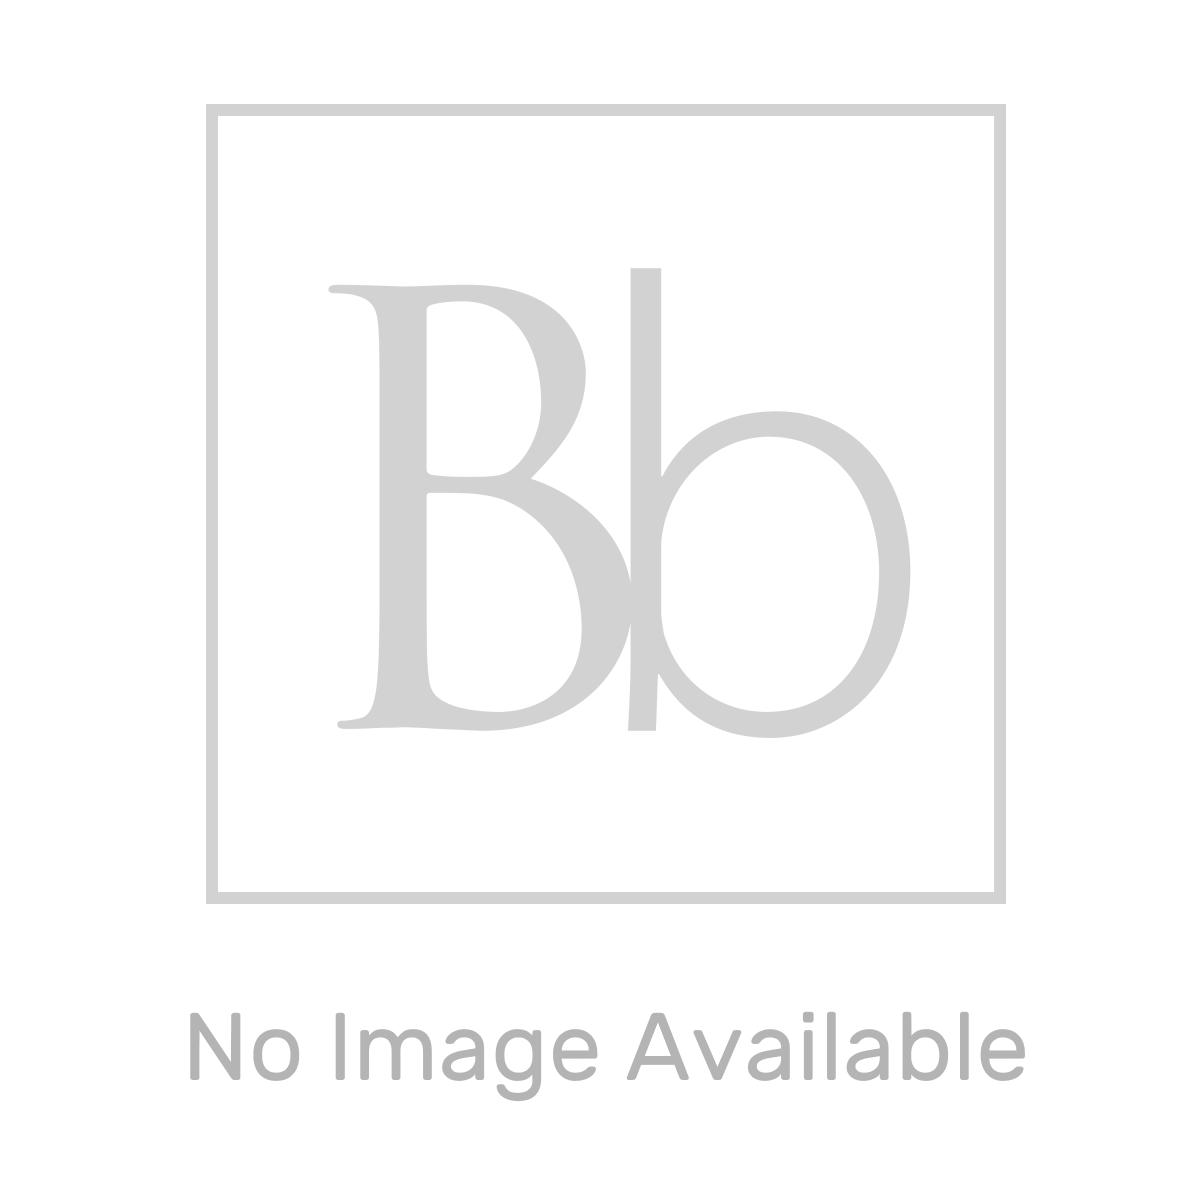 RAK Washington Grey Vanity Unit with Grey Countertop 1200mm